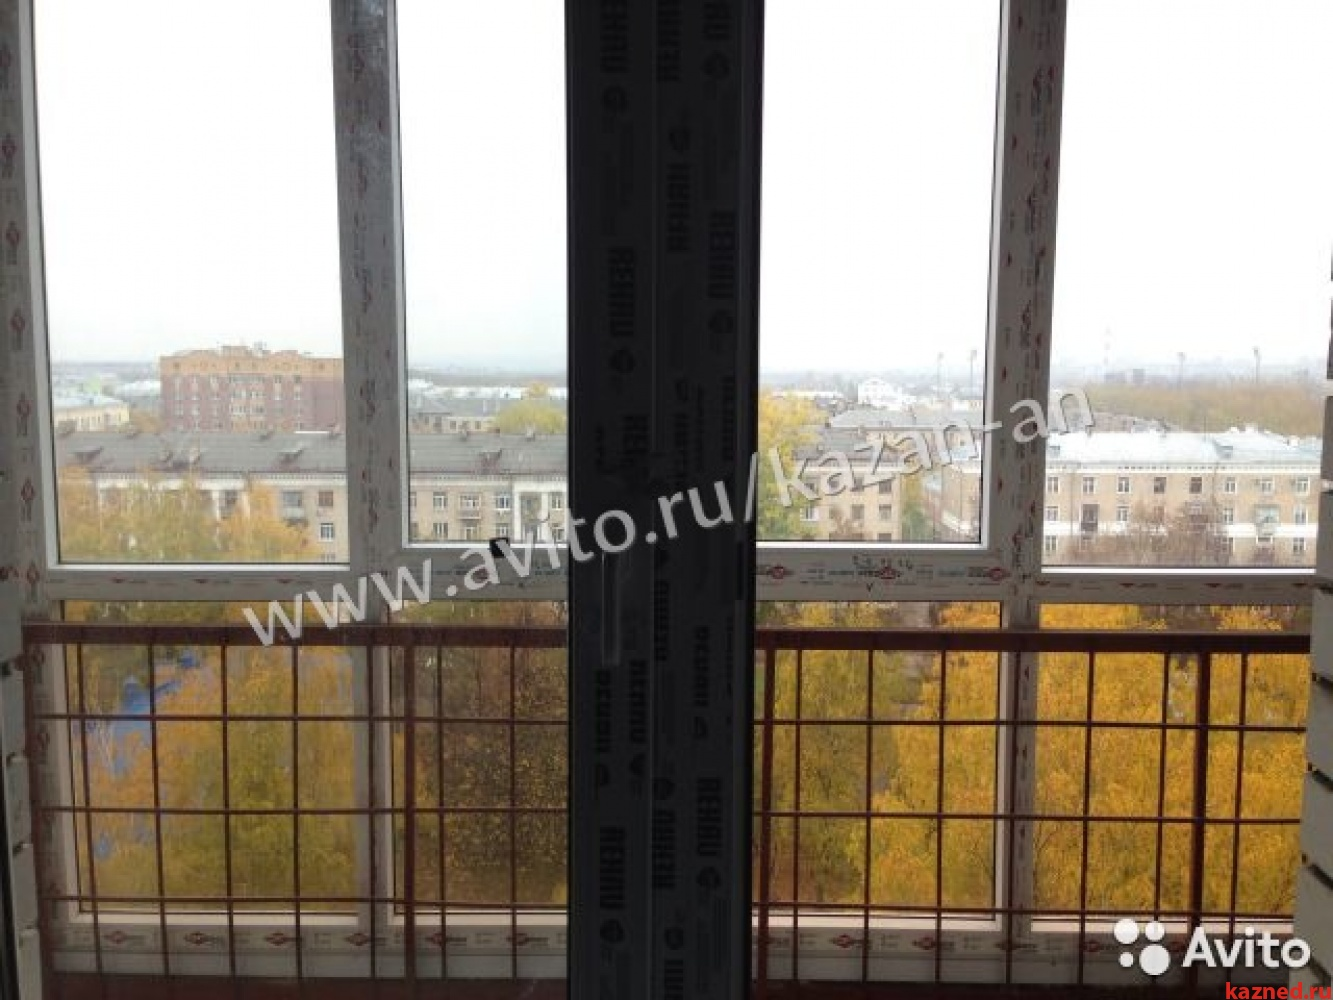 Продажа 1-к квартиры Лядова д15, 44 м² (миниатюра №5)